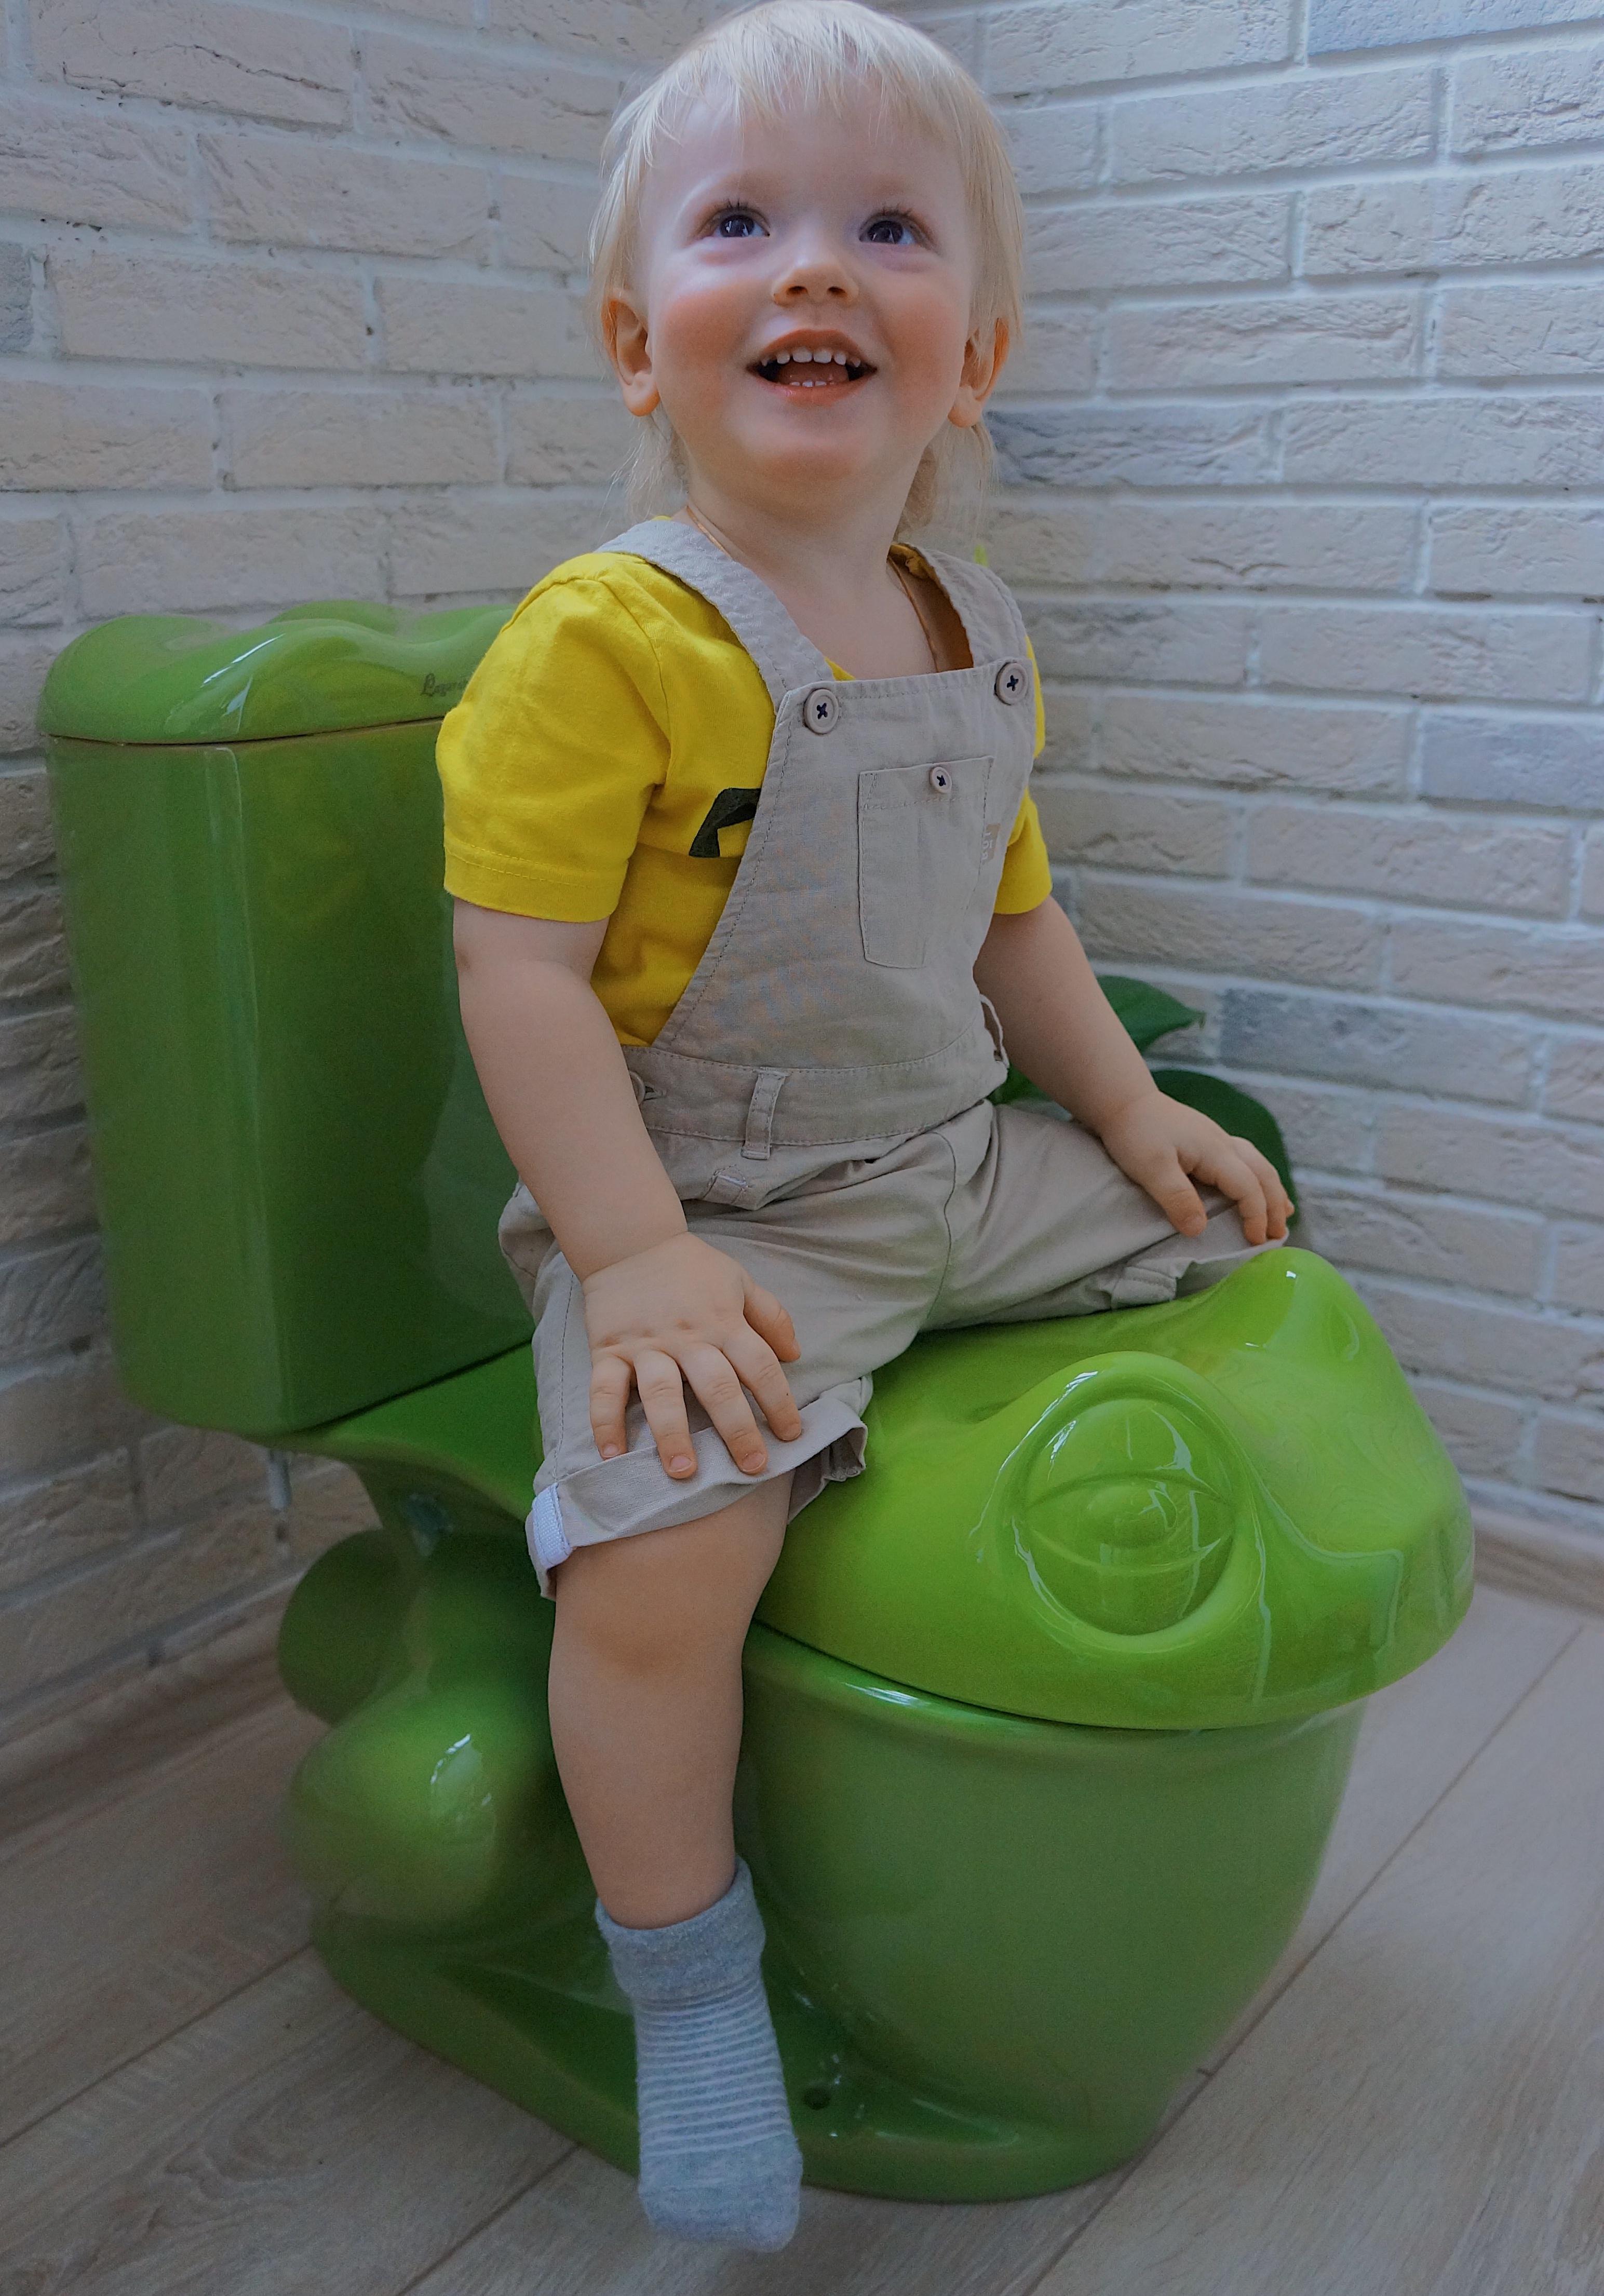 Фото 6527: Детский Унитаз Агуша Laguraty (лягушка)